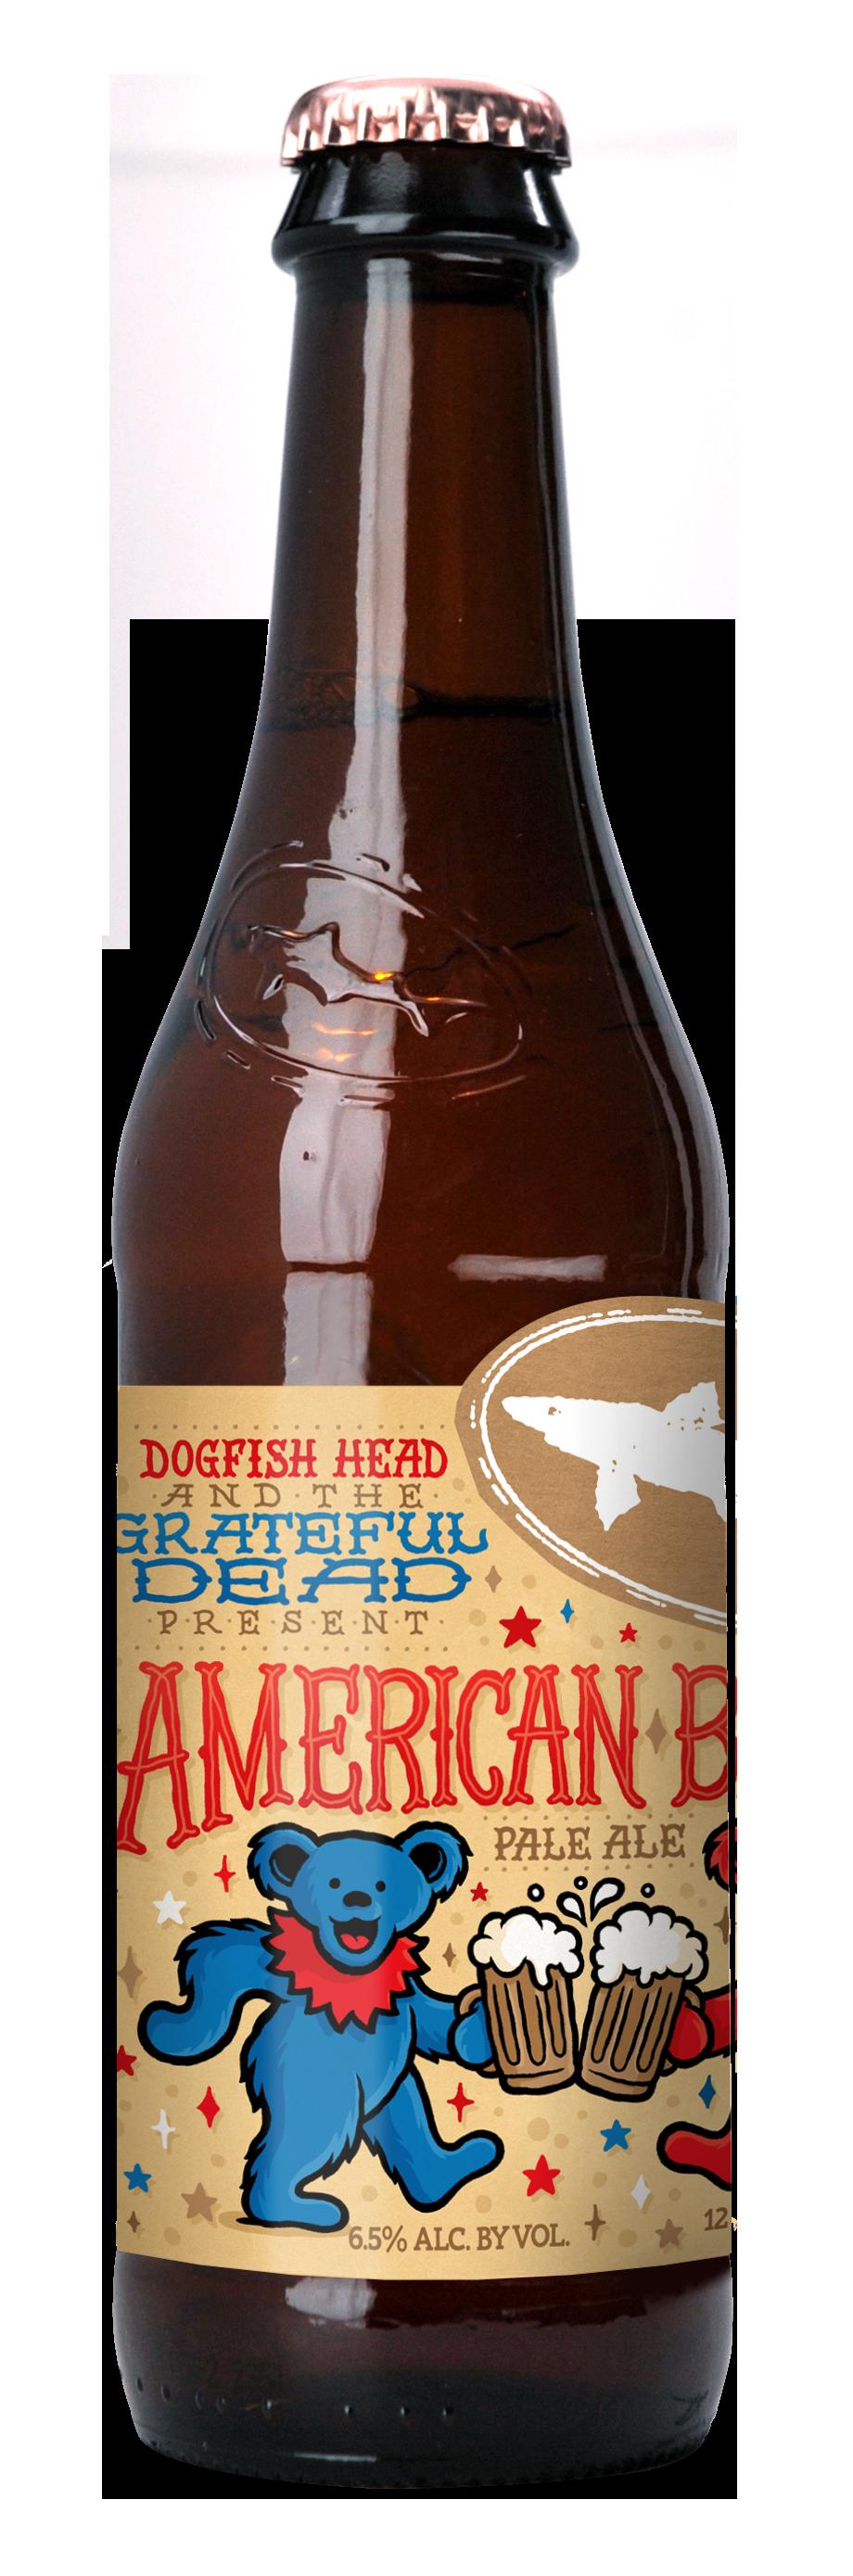 Grateful Dead February 2019 Calendar 2019 Beer Release Calendar | Dogfish Head Craft Brewed Ales | Off